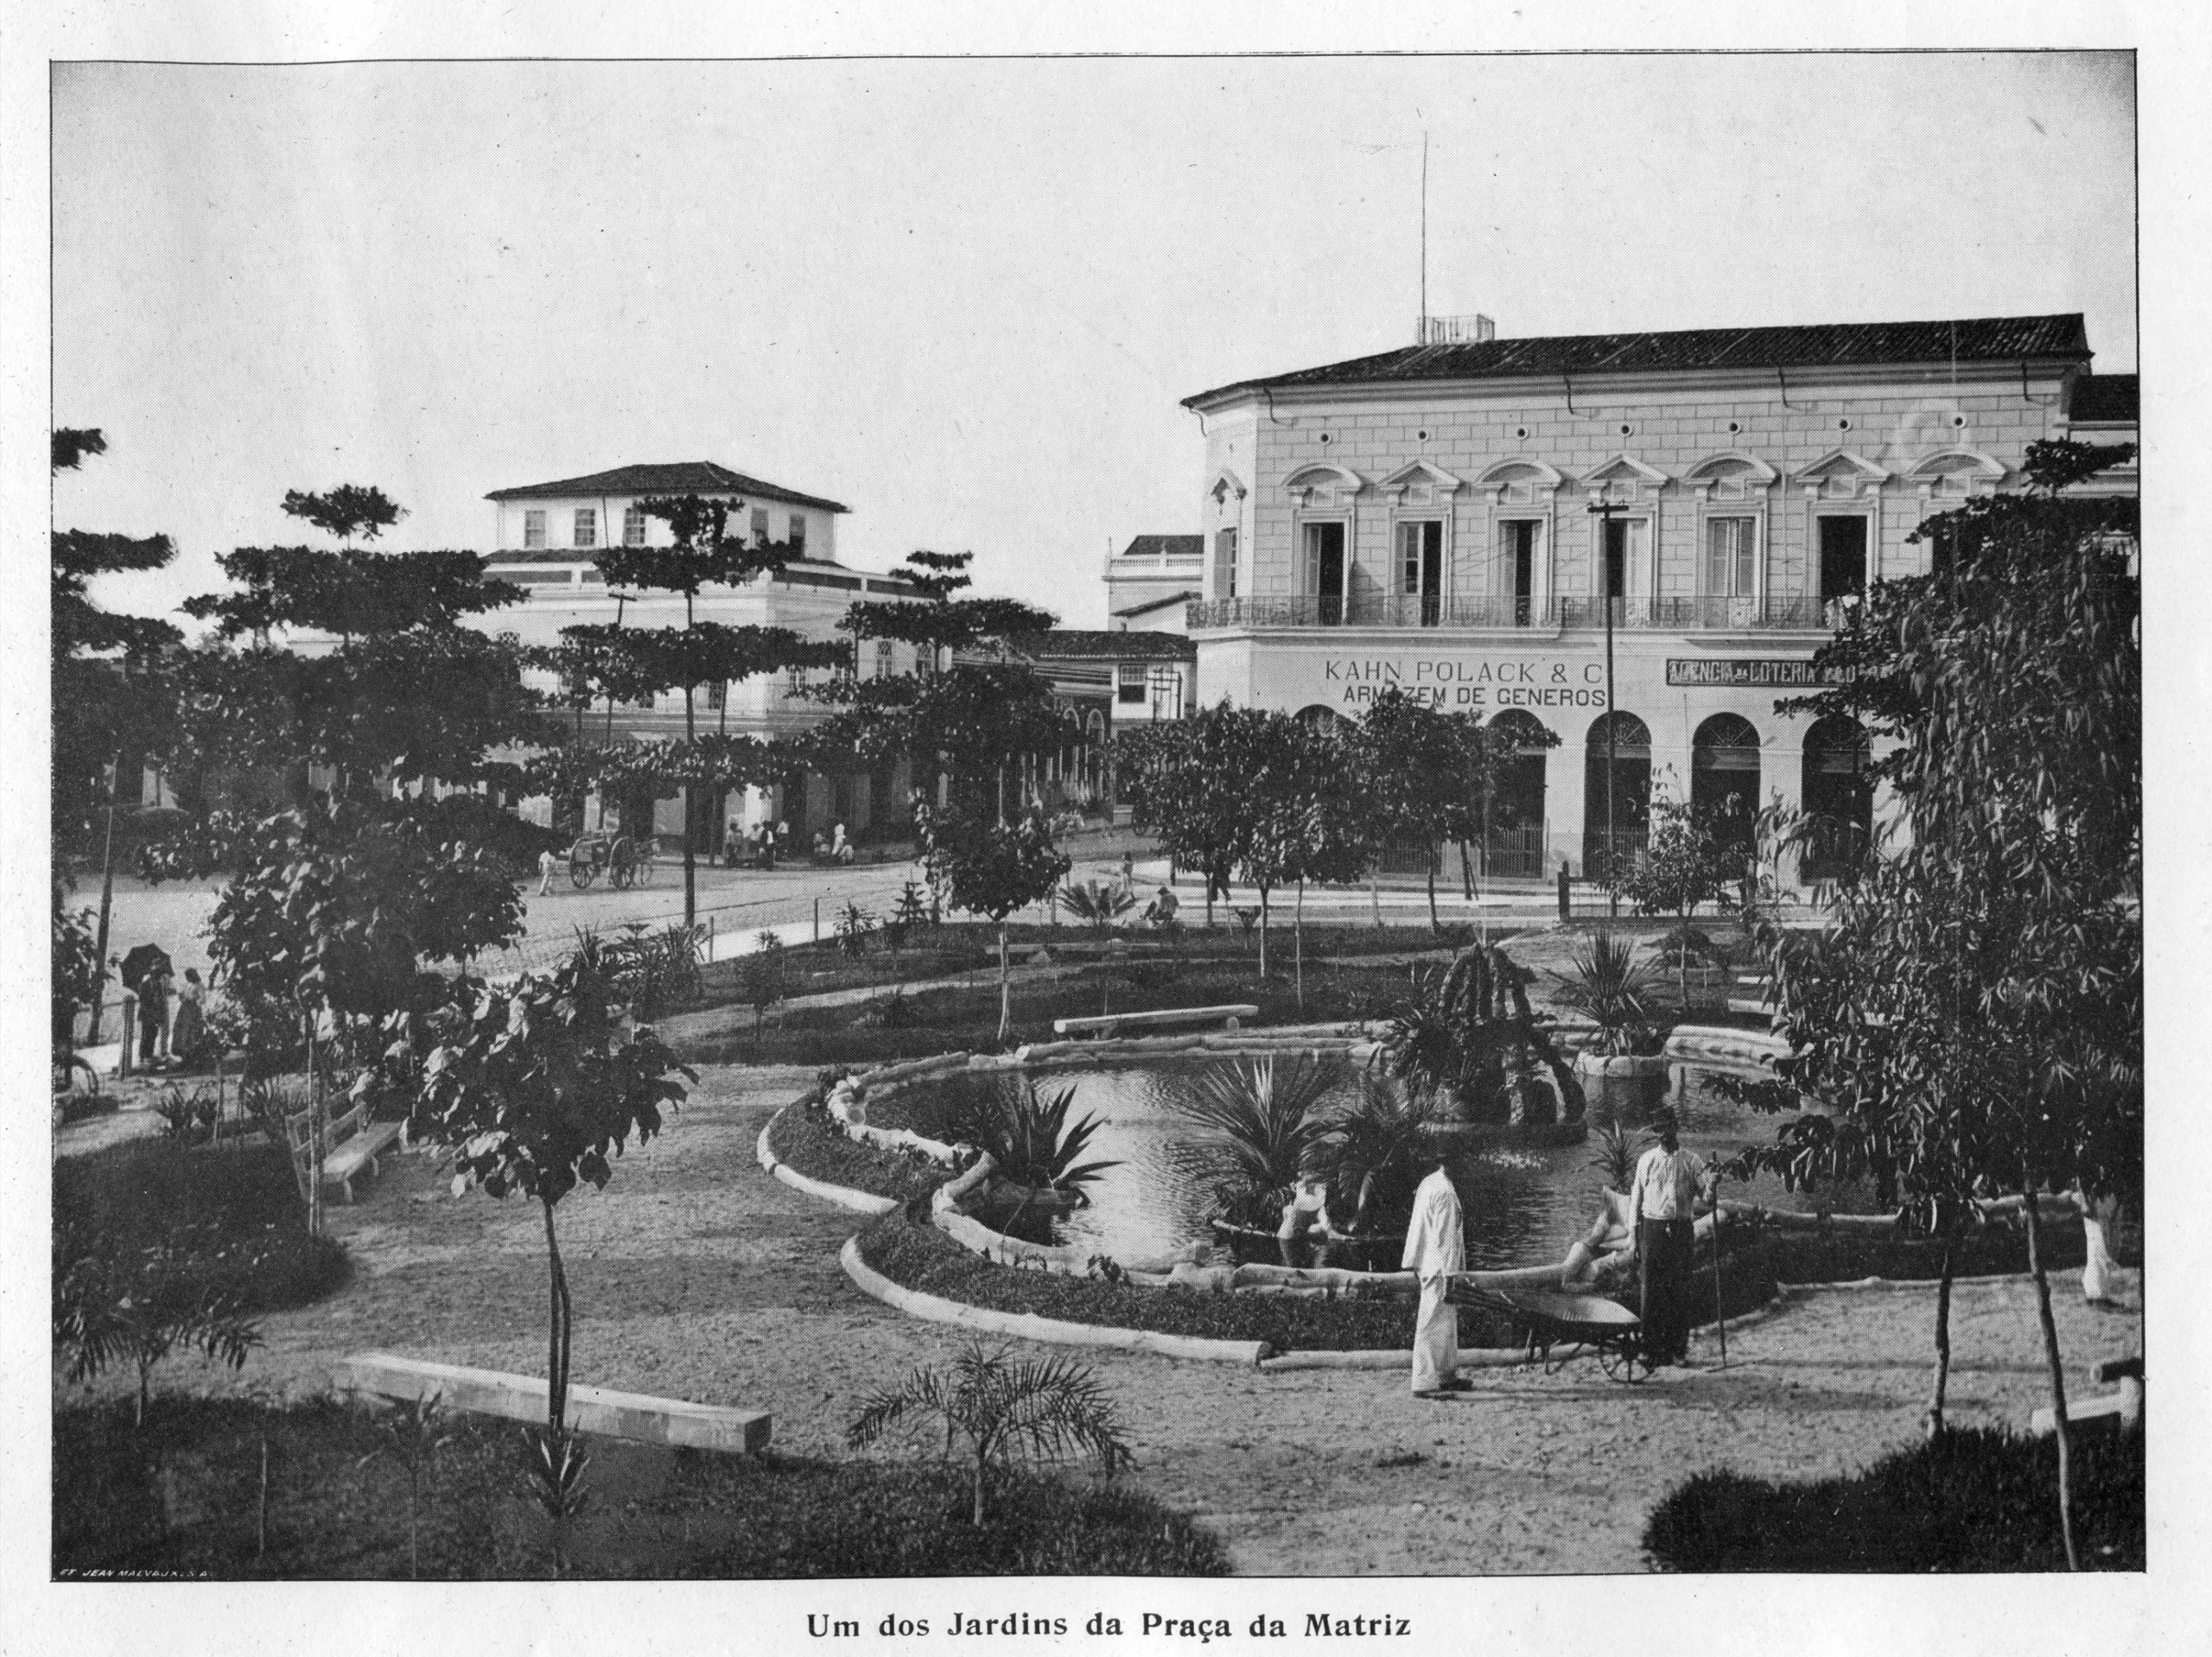 Um dos Jardins da Praça da Matriz